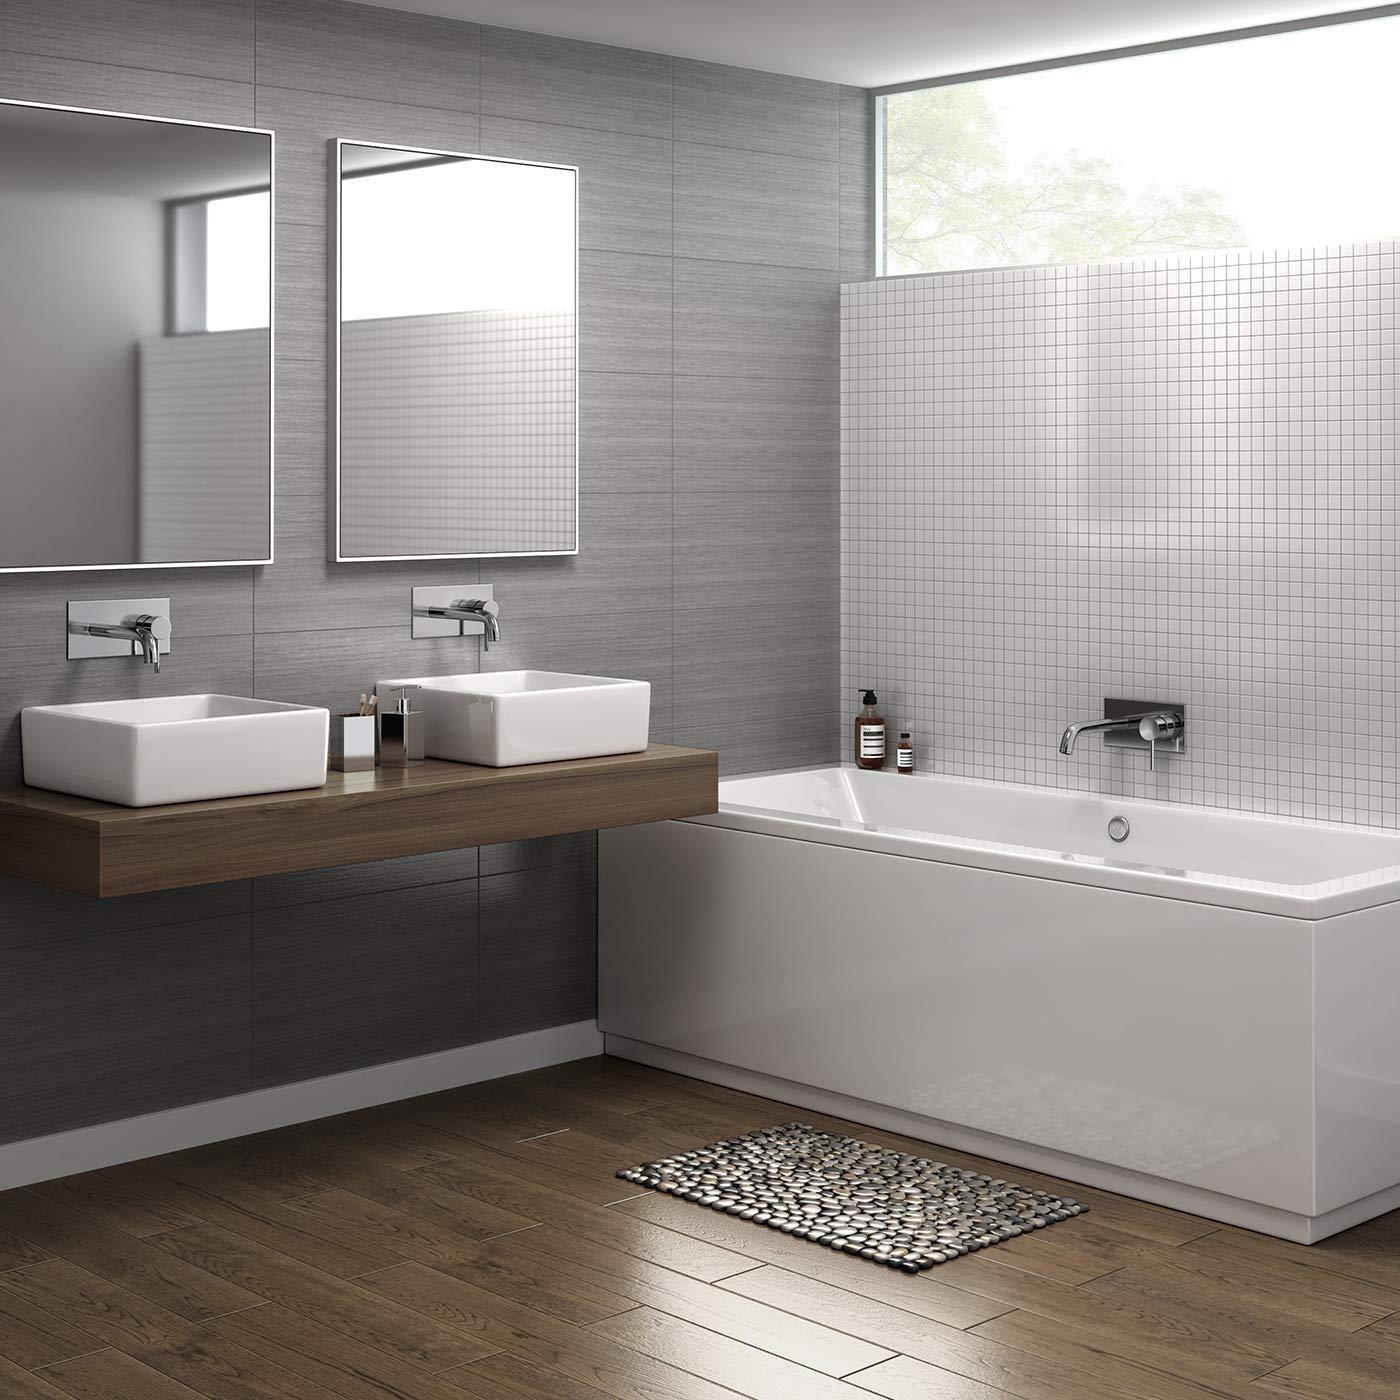 Wall Mounted Basin Sink Mixer Tap Chrome Bathroom Faucet TB3207 iBathUK